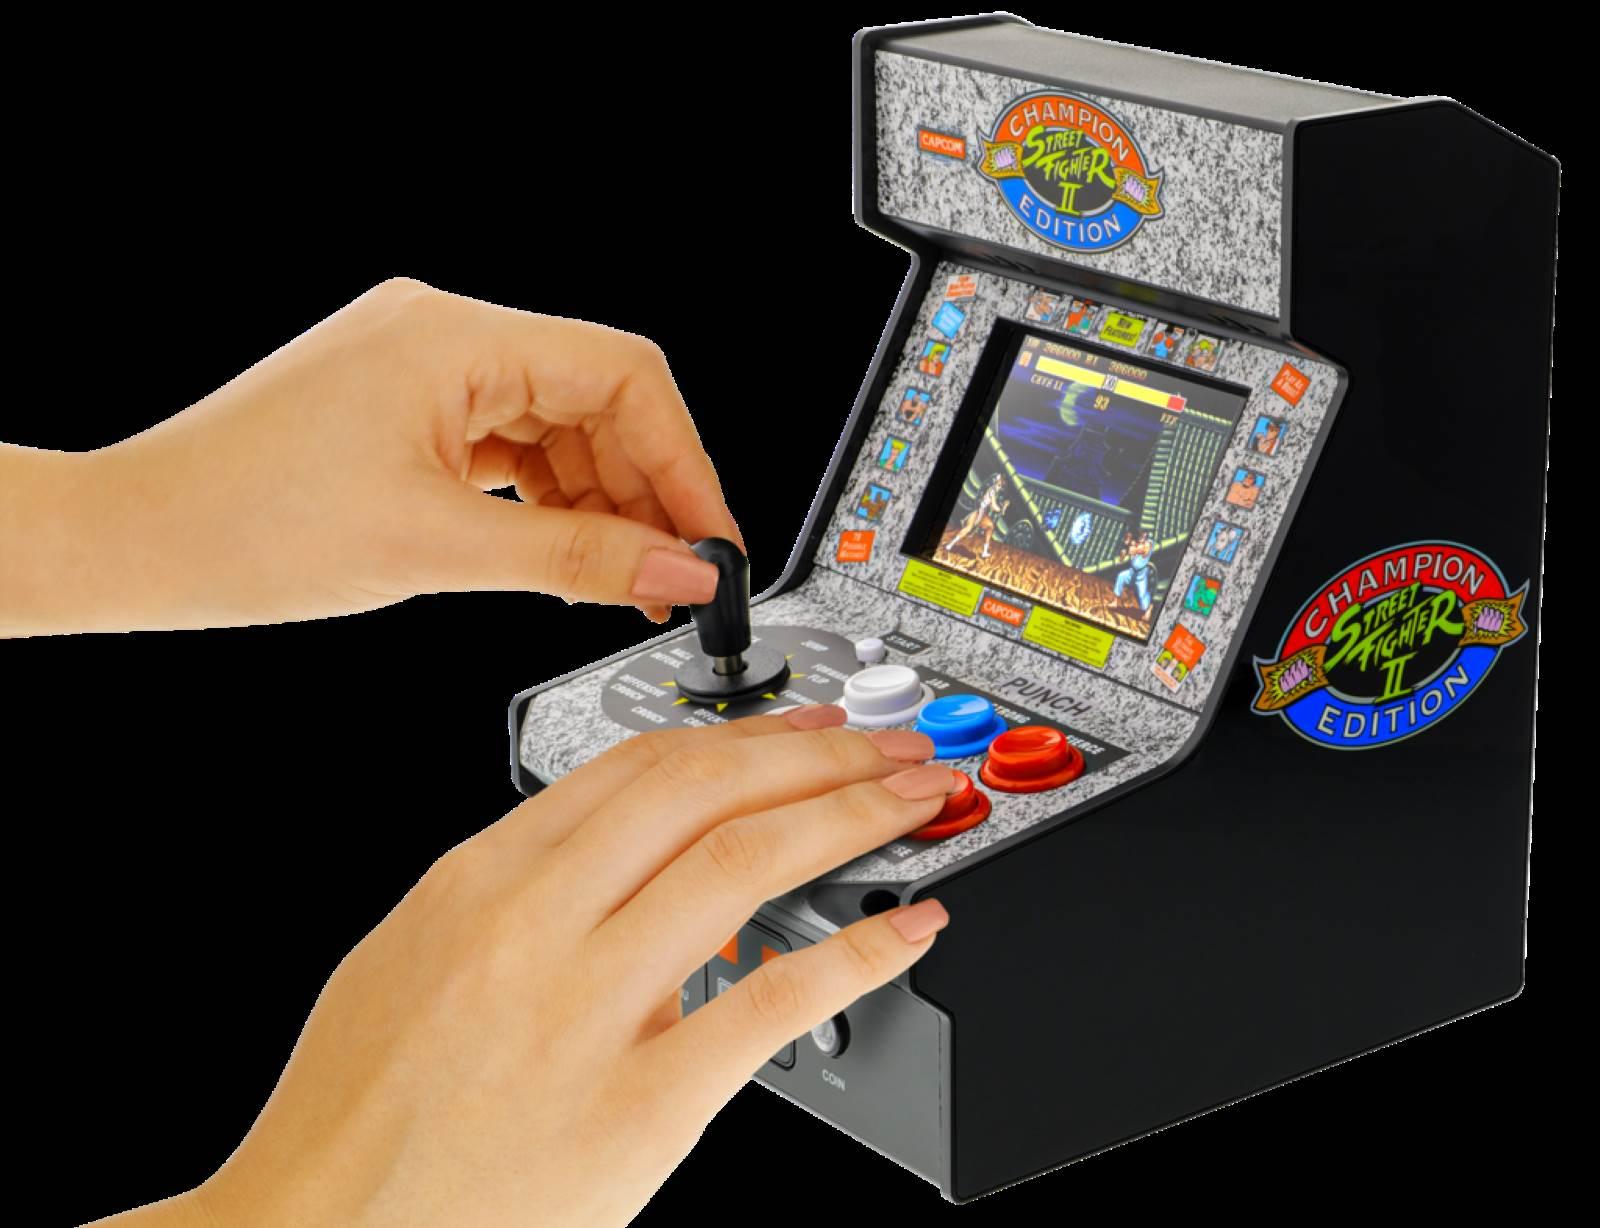 Street Fighter II aparat